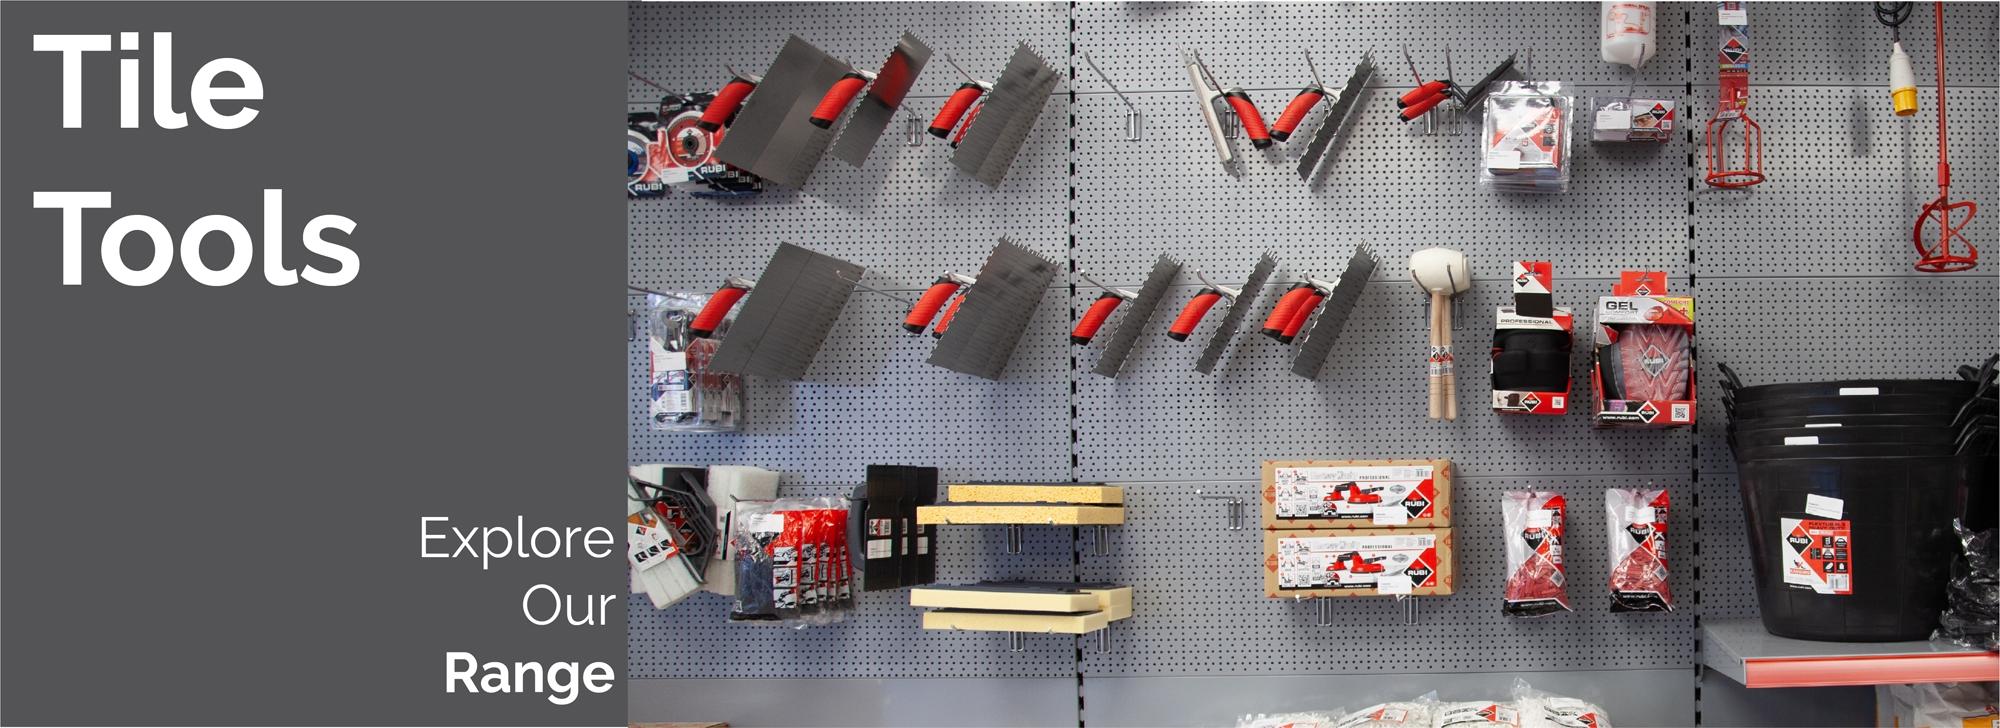 Tile Tools